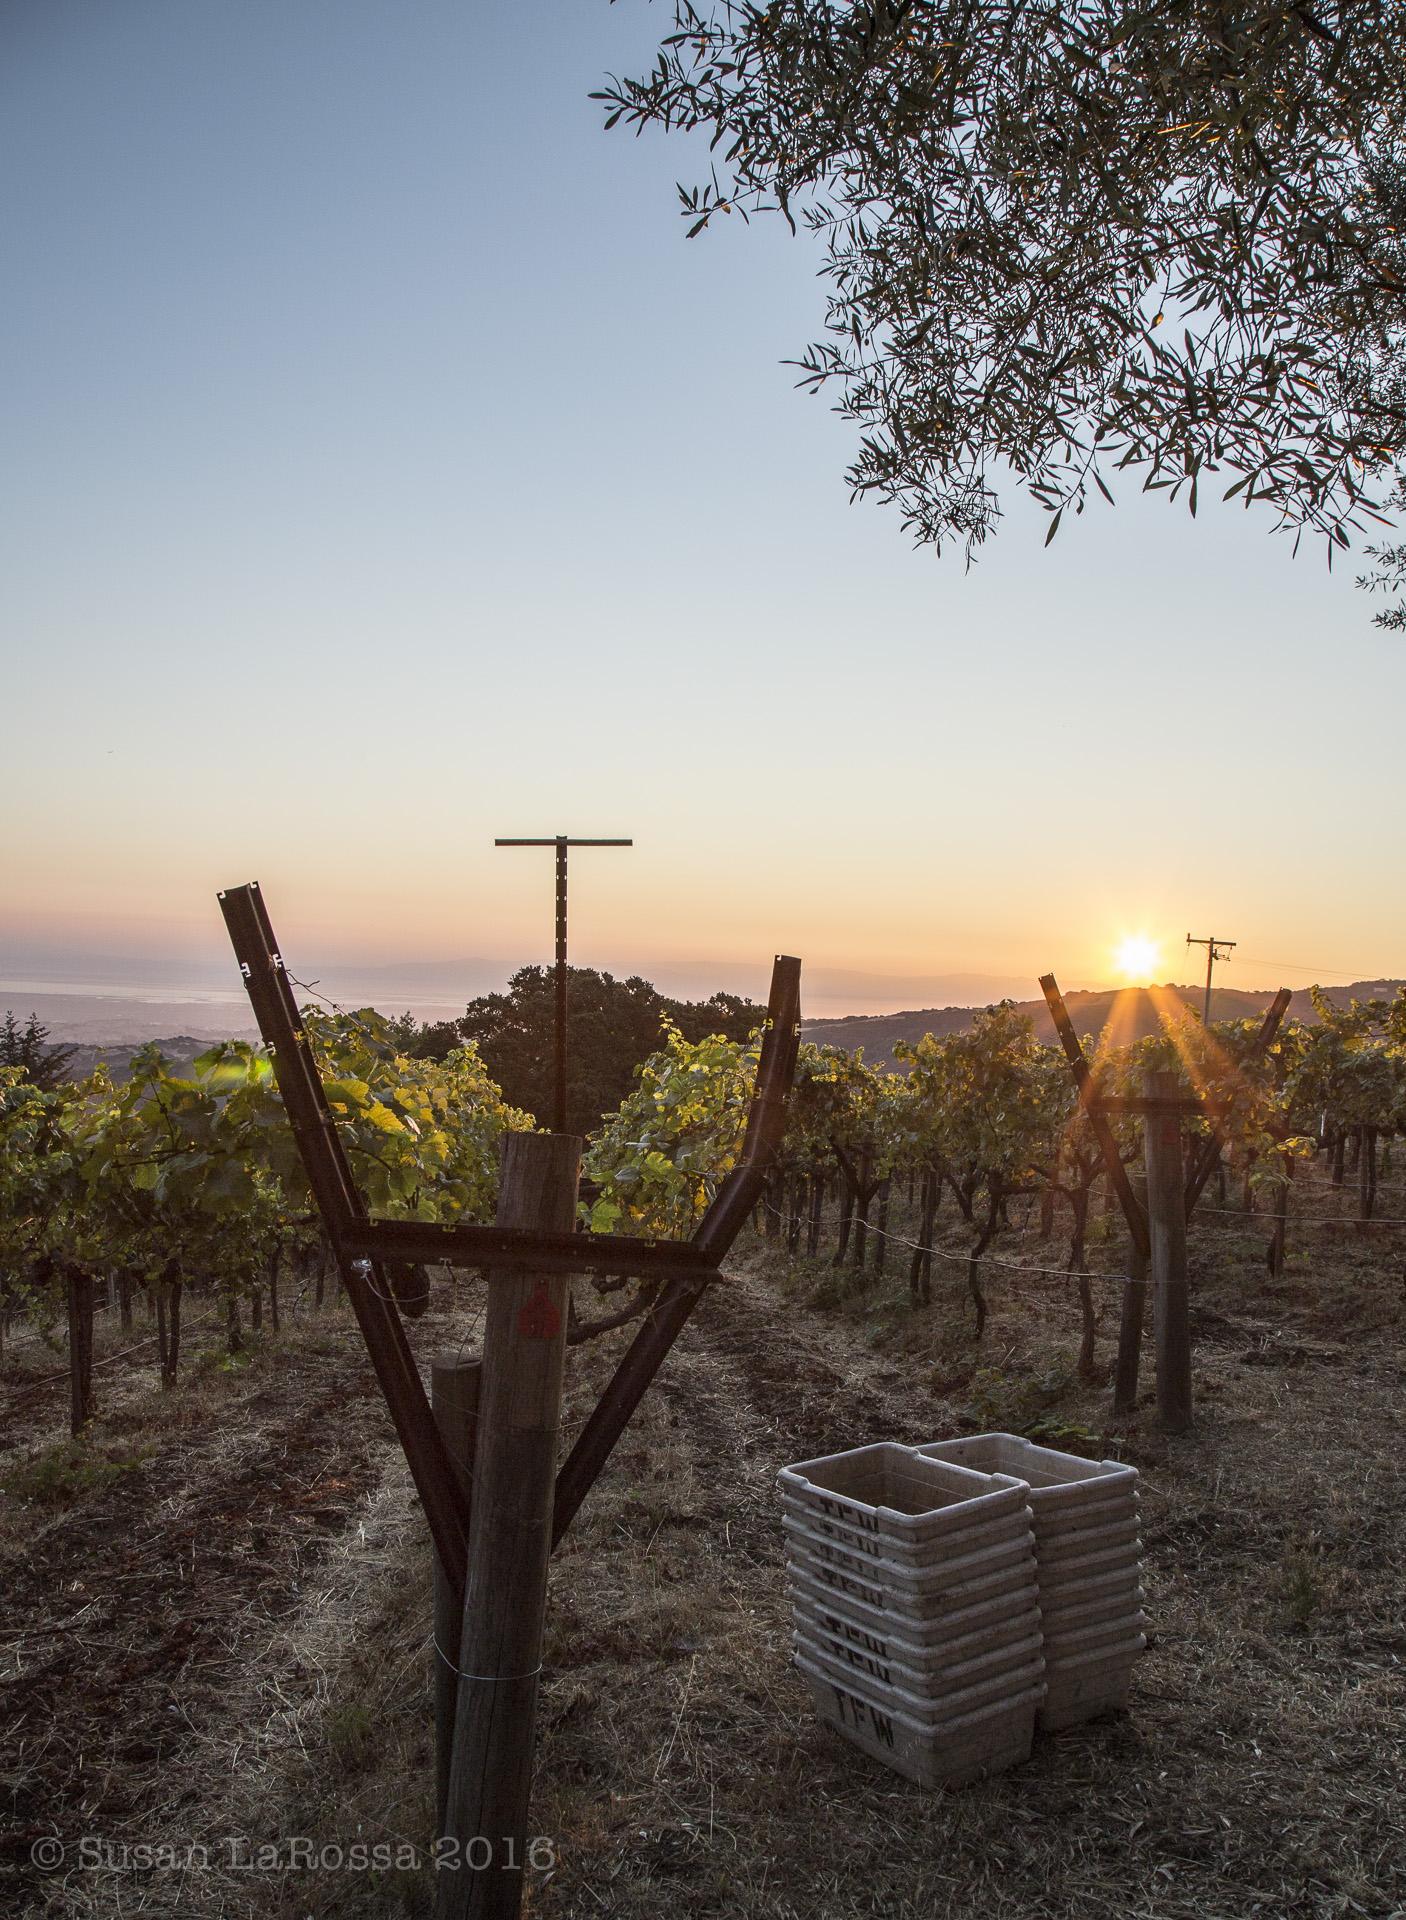 Rapley Trail Vineyard at dawn, September 7, 2016